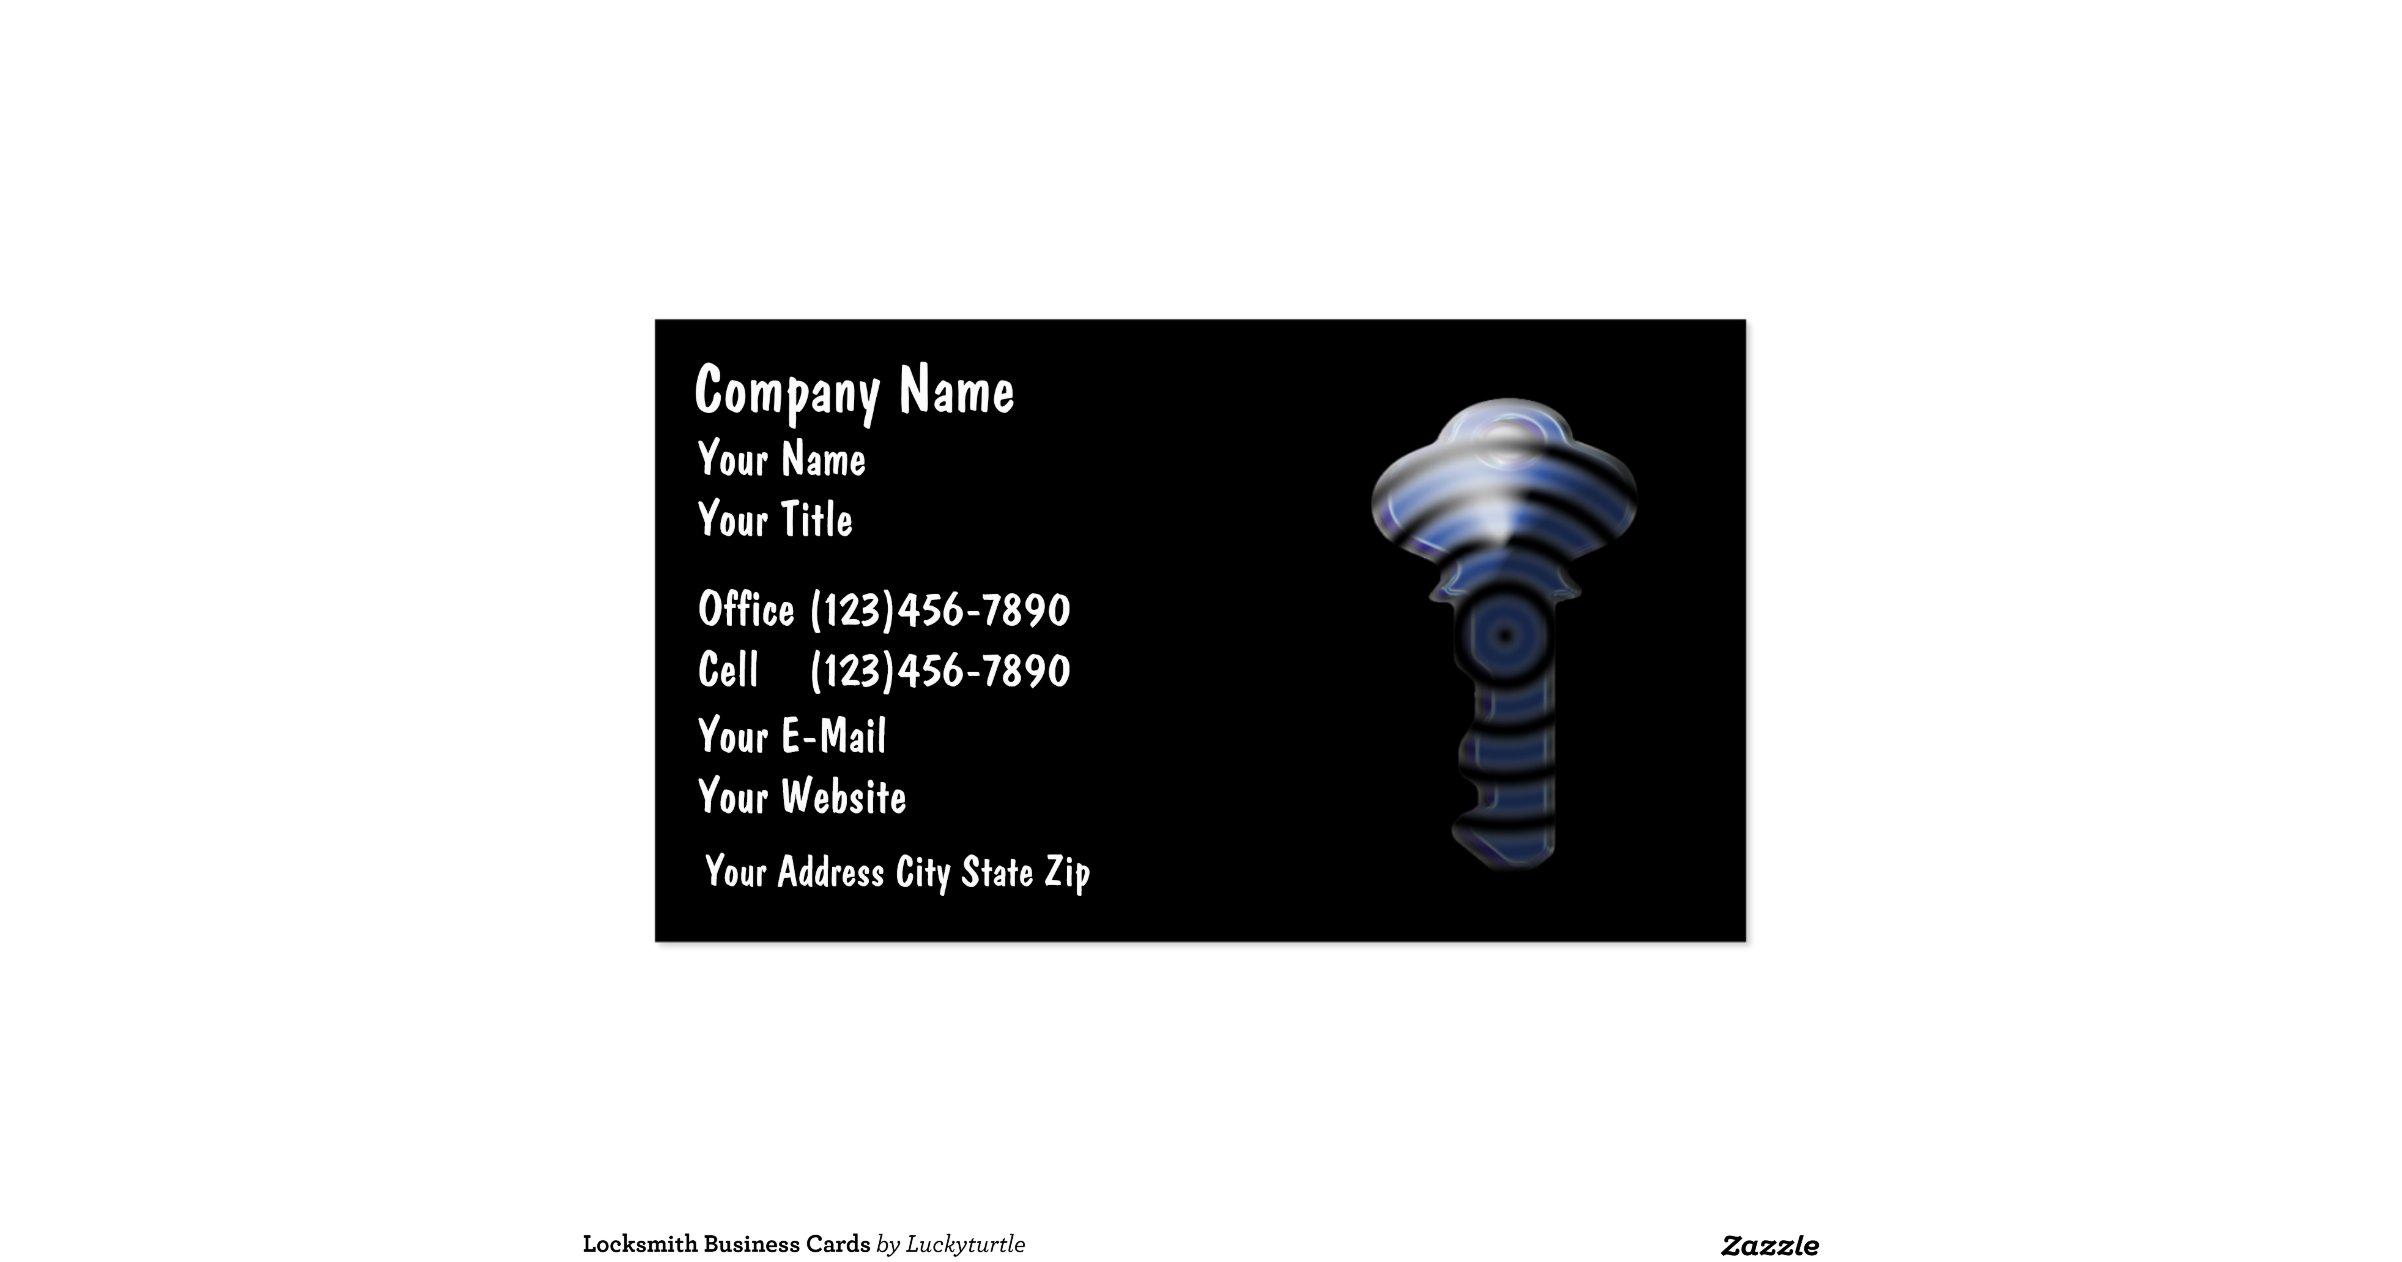 Locksmith business cards r4cc5f0678557447098b39327212290f6 for Locksmith business cards